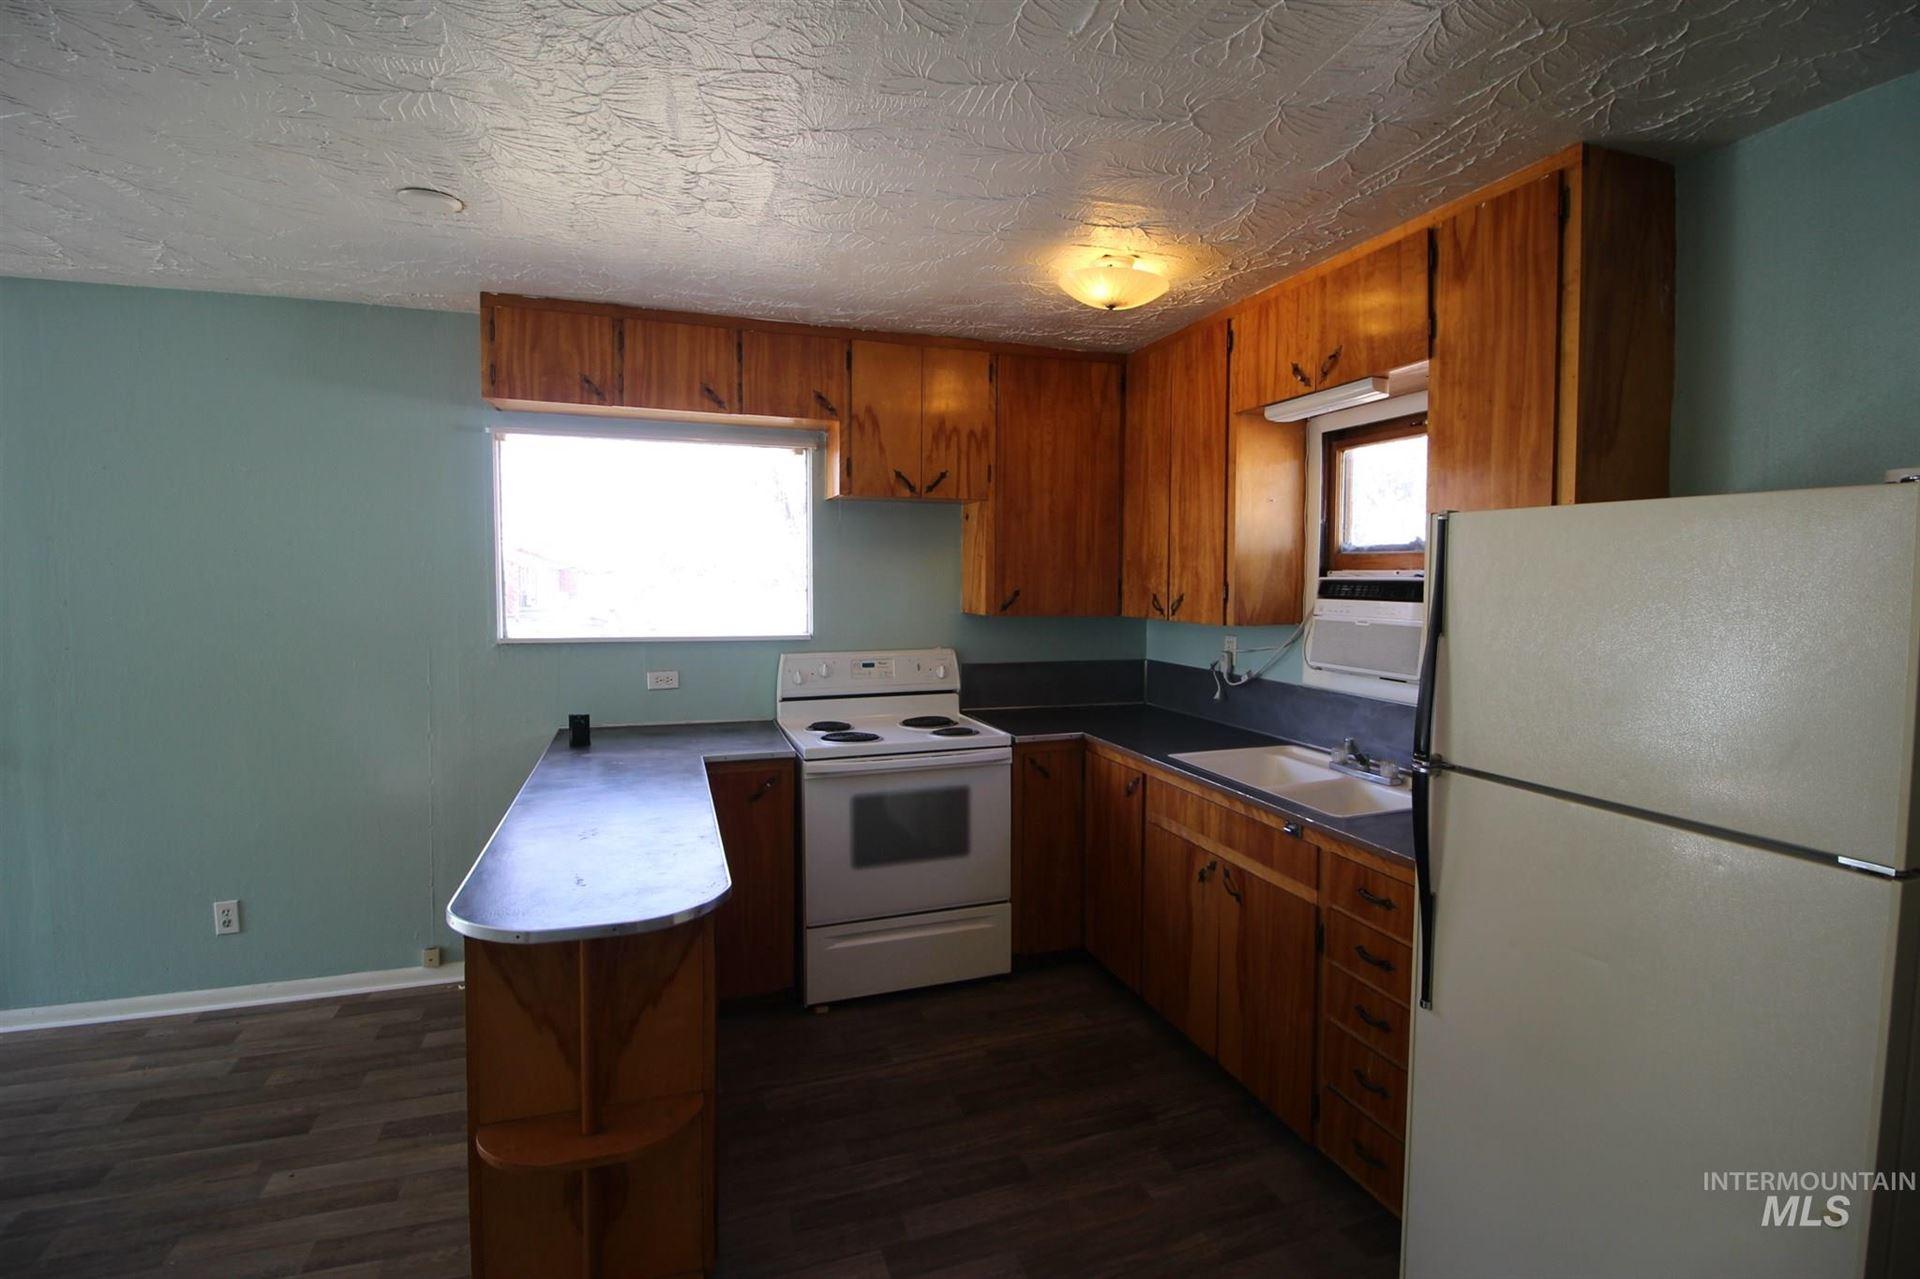 Photo of 860 N 3rd East, Mountain Home, ID 83647 (MLS # 98790646)